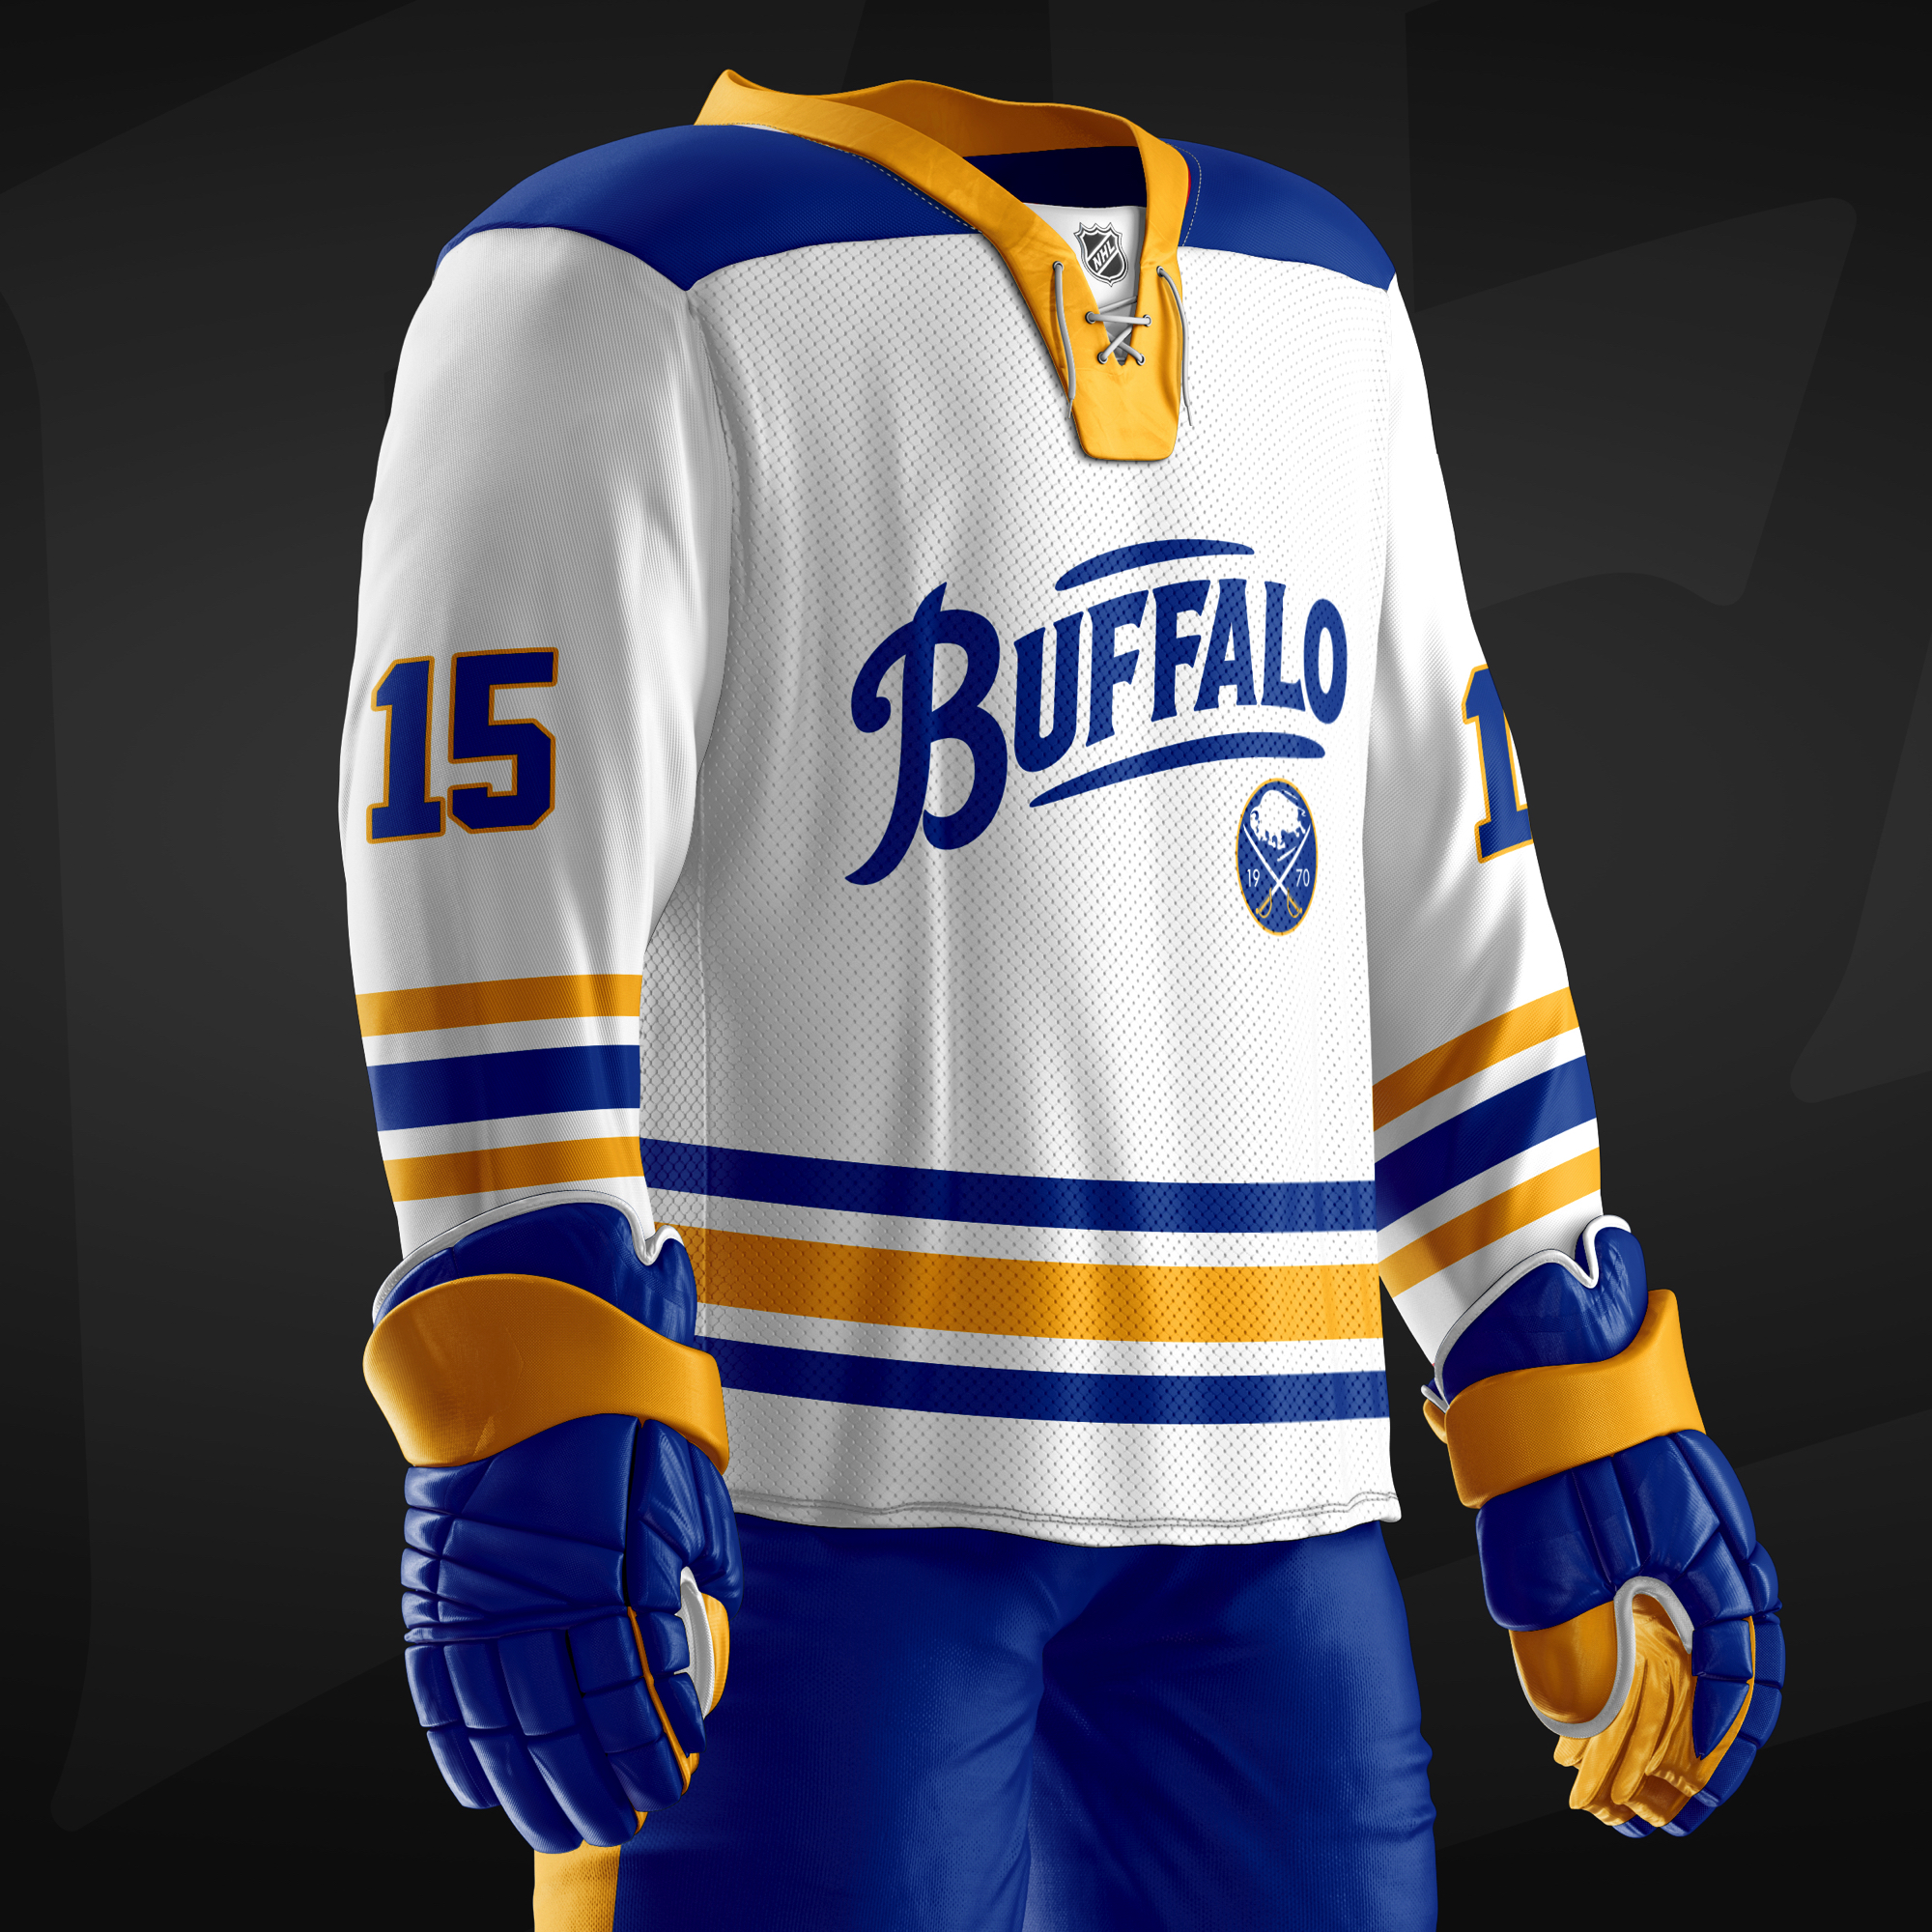 promo code 6aba0 75c22 buffalo sabres original jersey